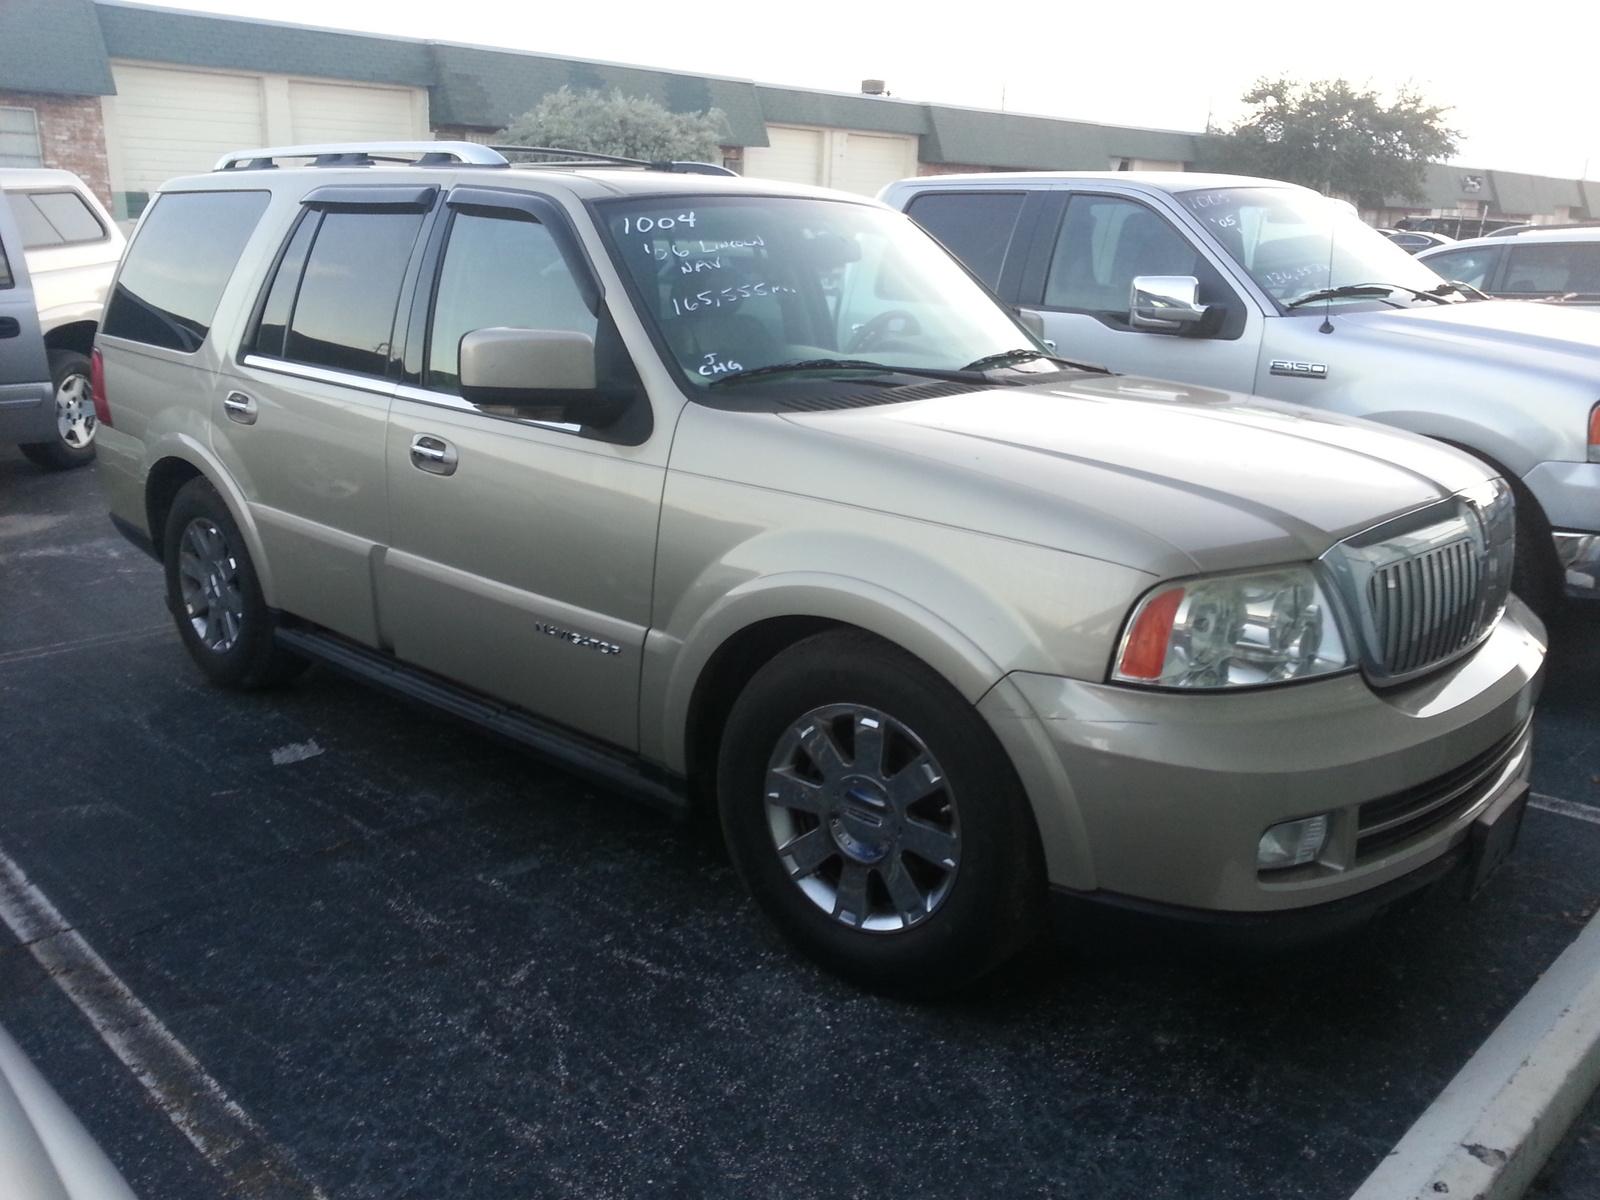 2006 Lincoln Navigator - Pictures - CarGurus